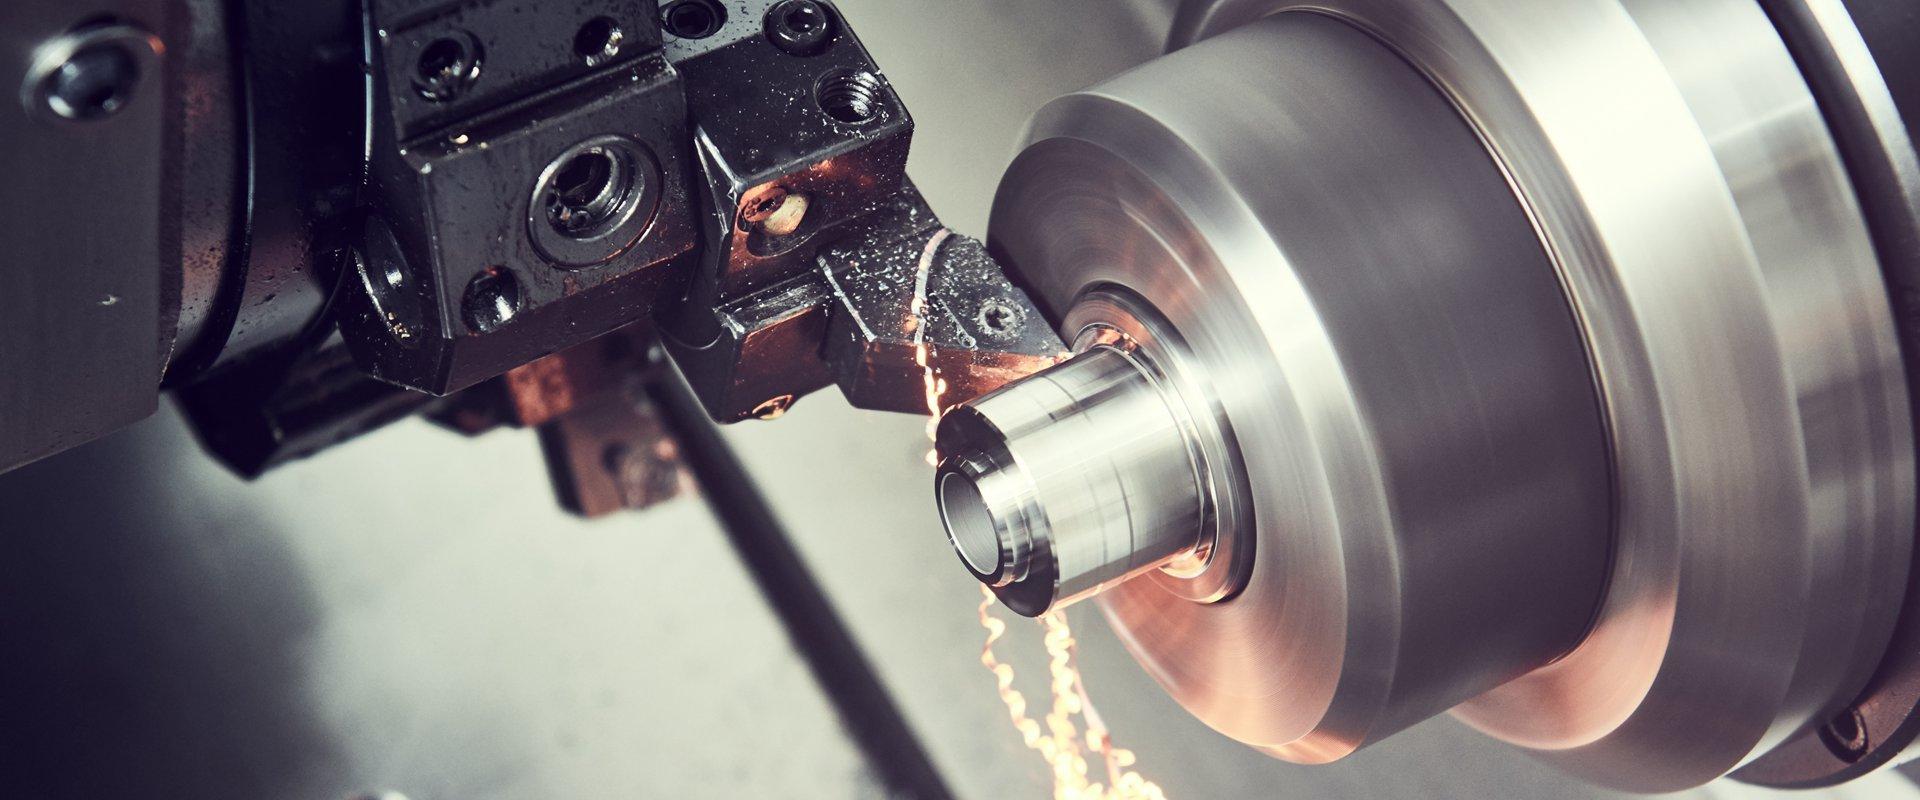 CNC MACHINING TURING